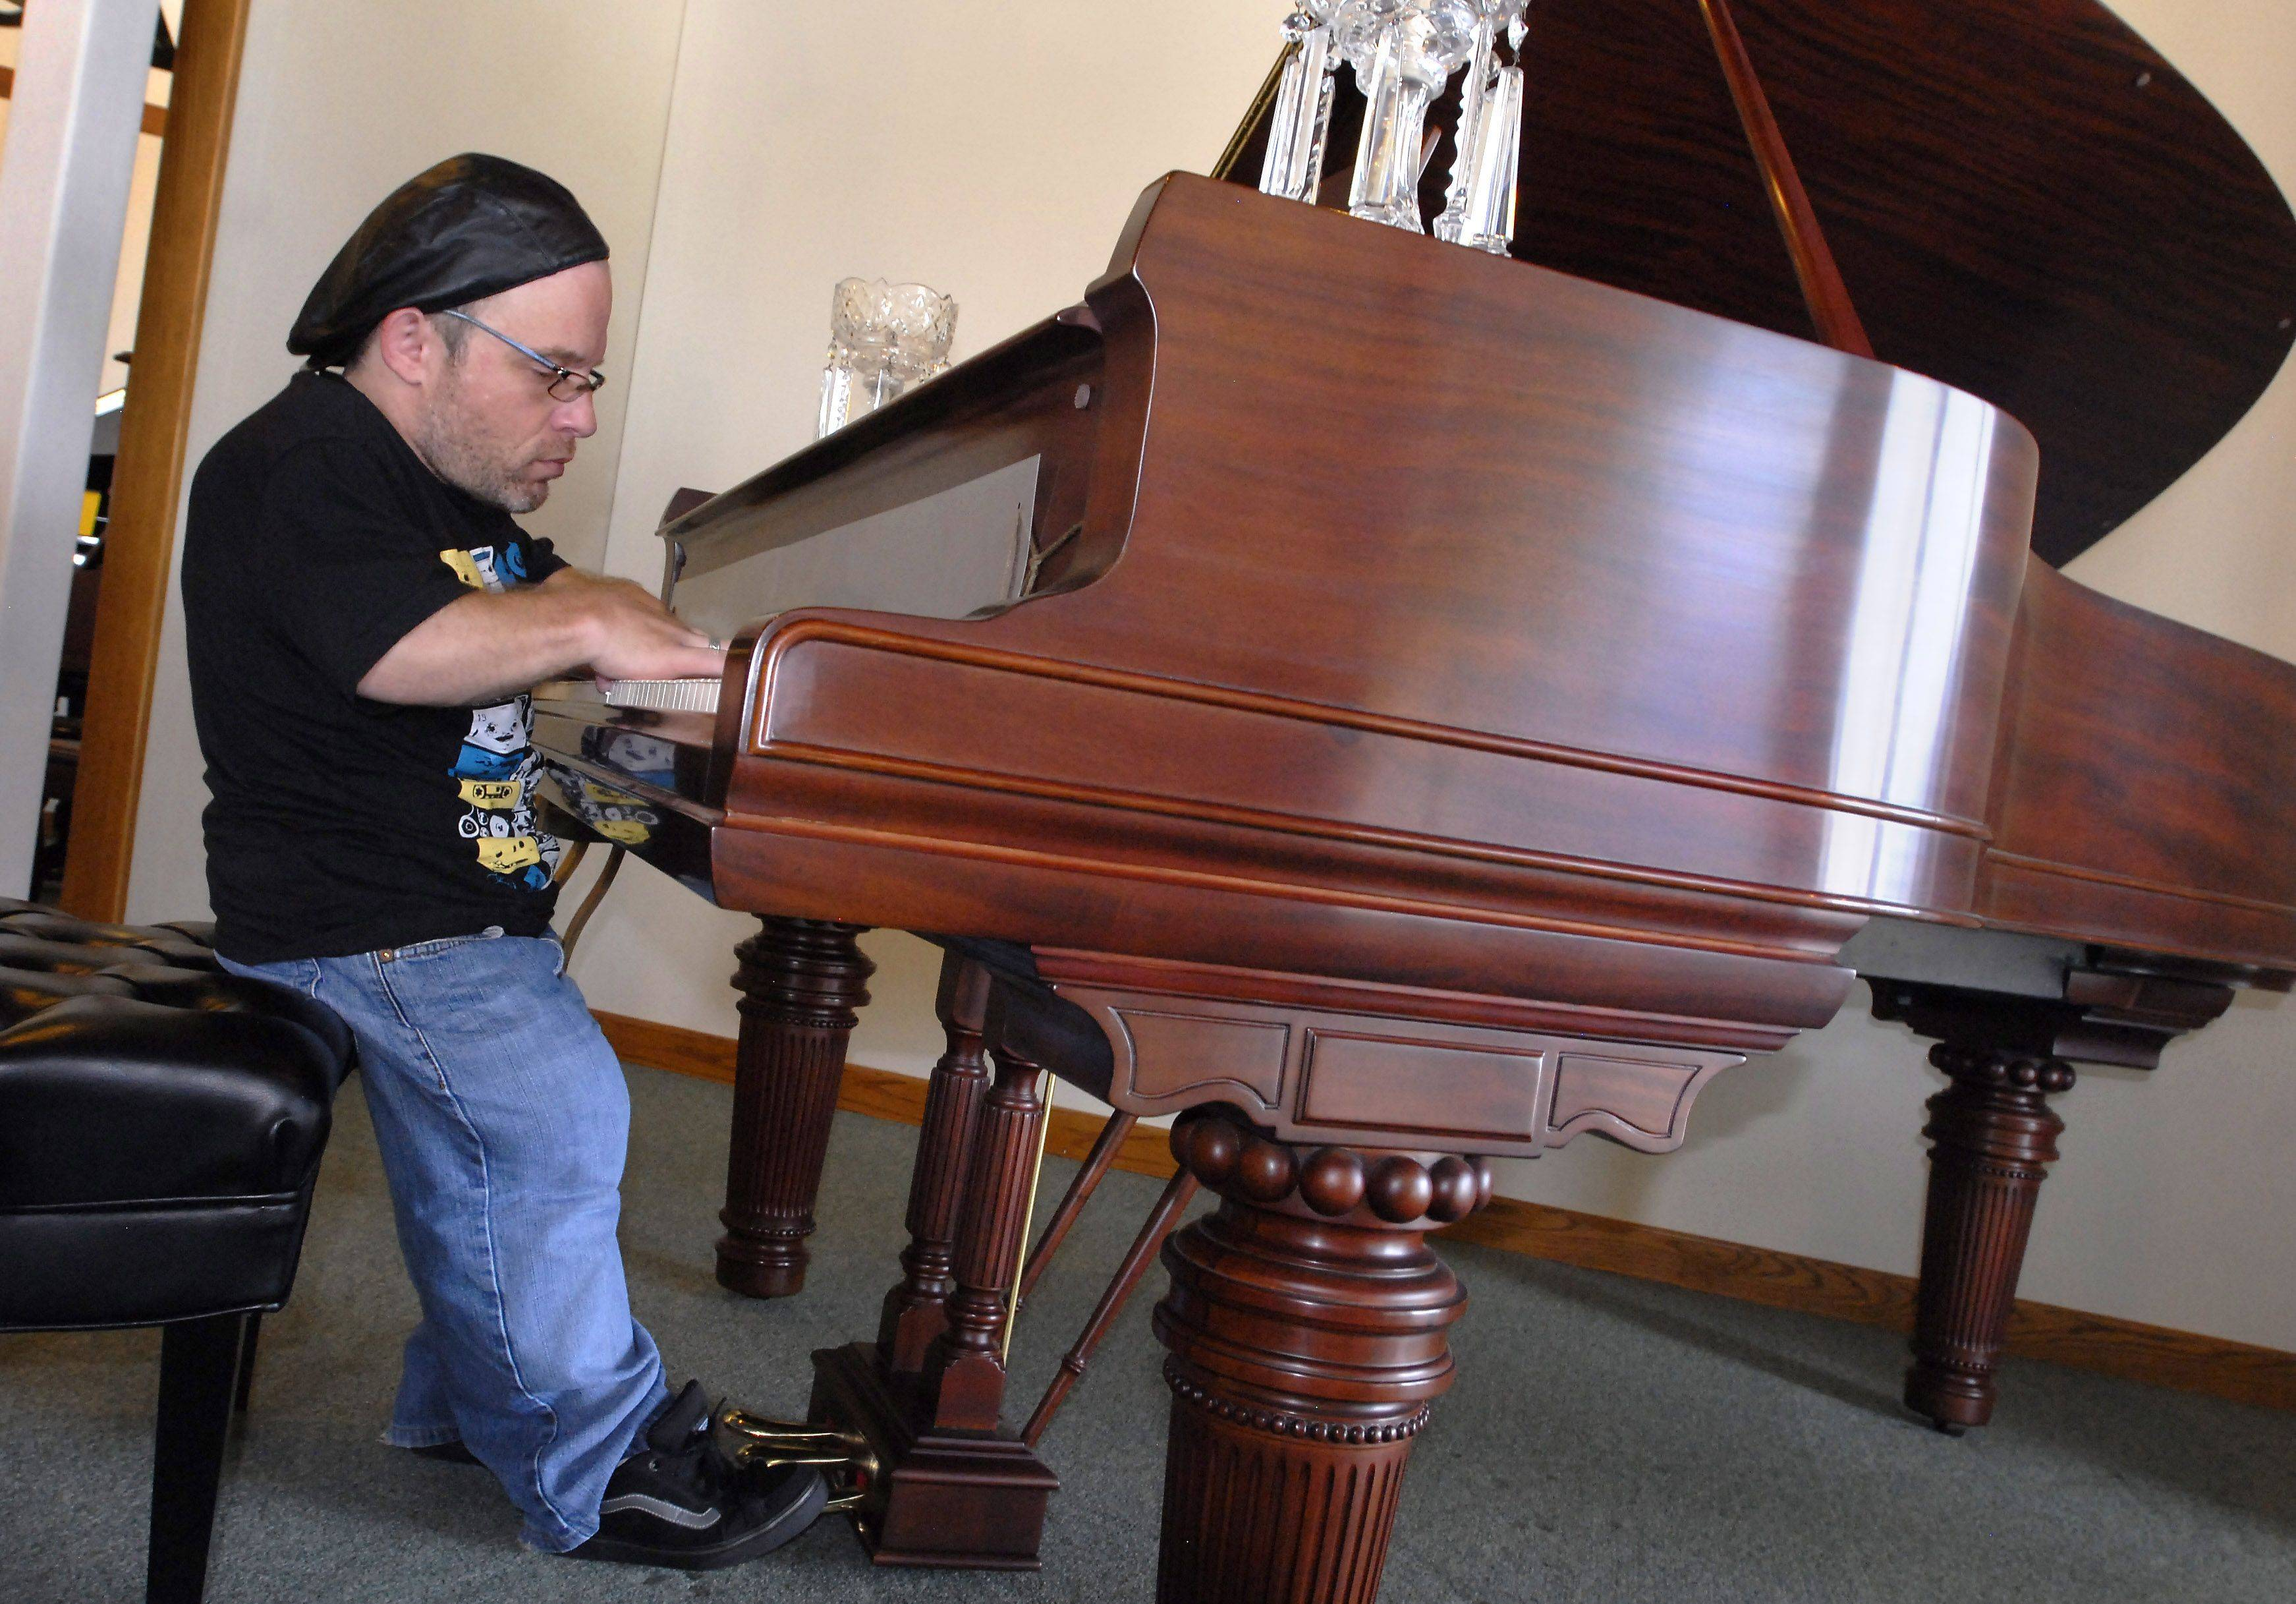 Midget Jazz Pianist